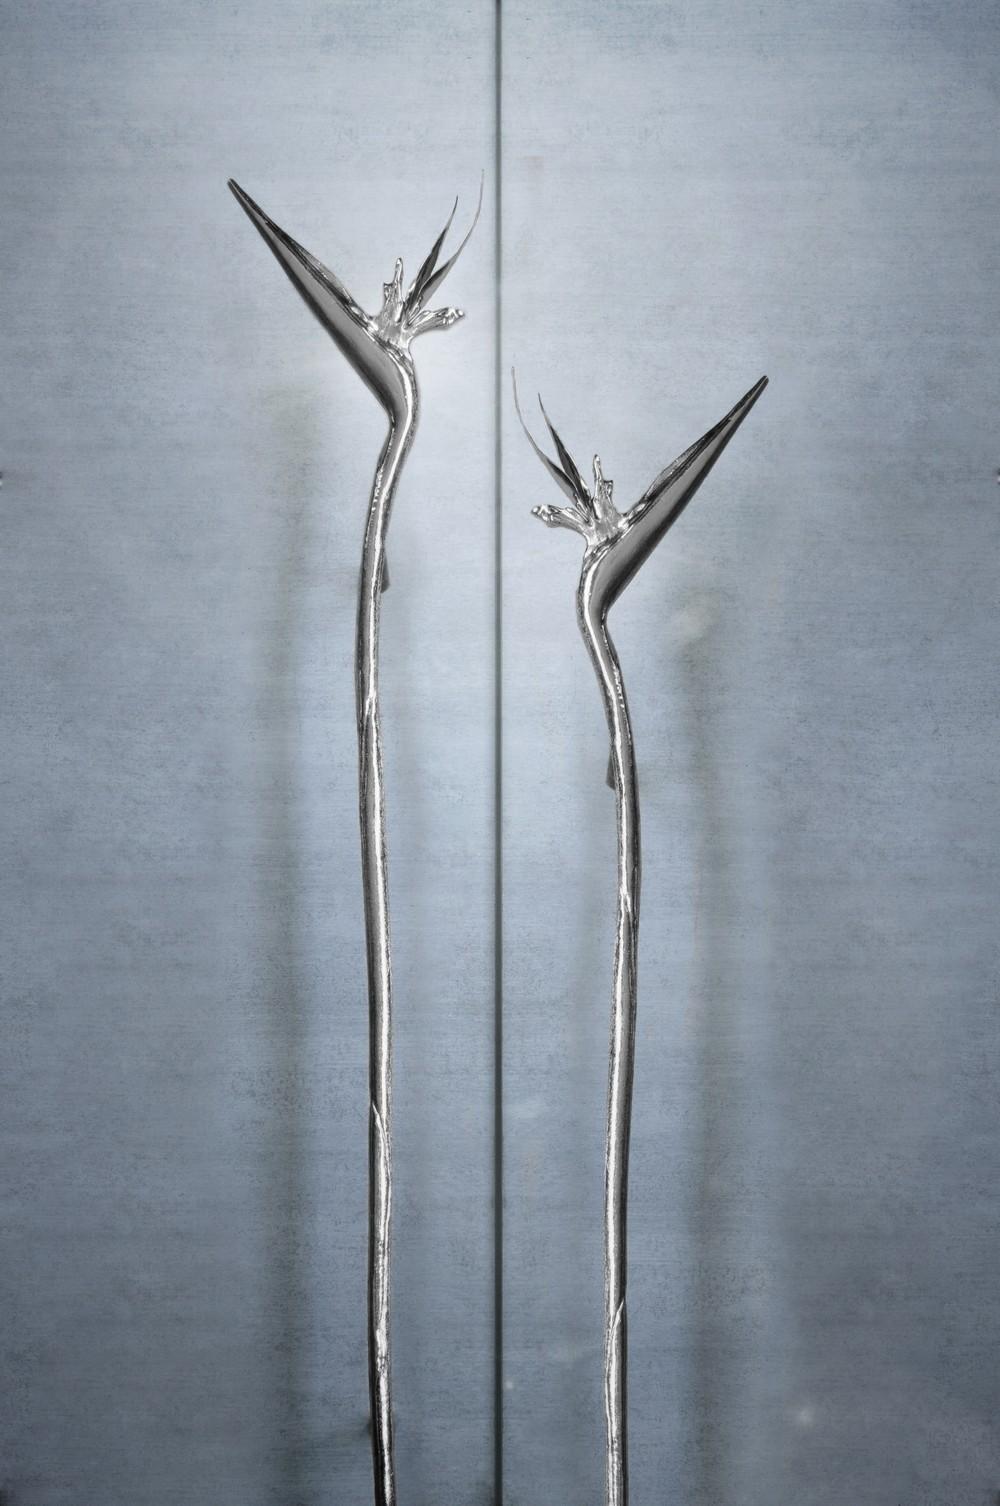 Admire 9 Exclusive Decorative Hardware Pieces in Lustrous Silver Tones 9